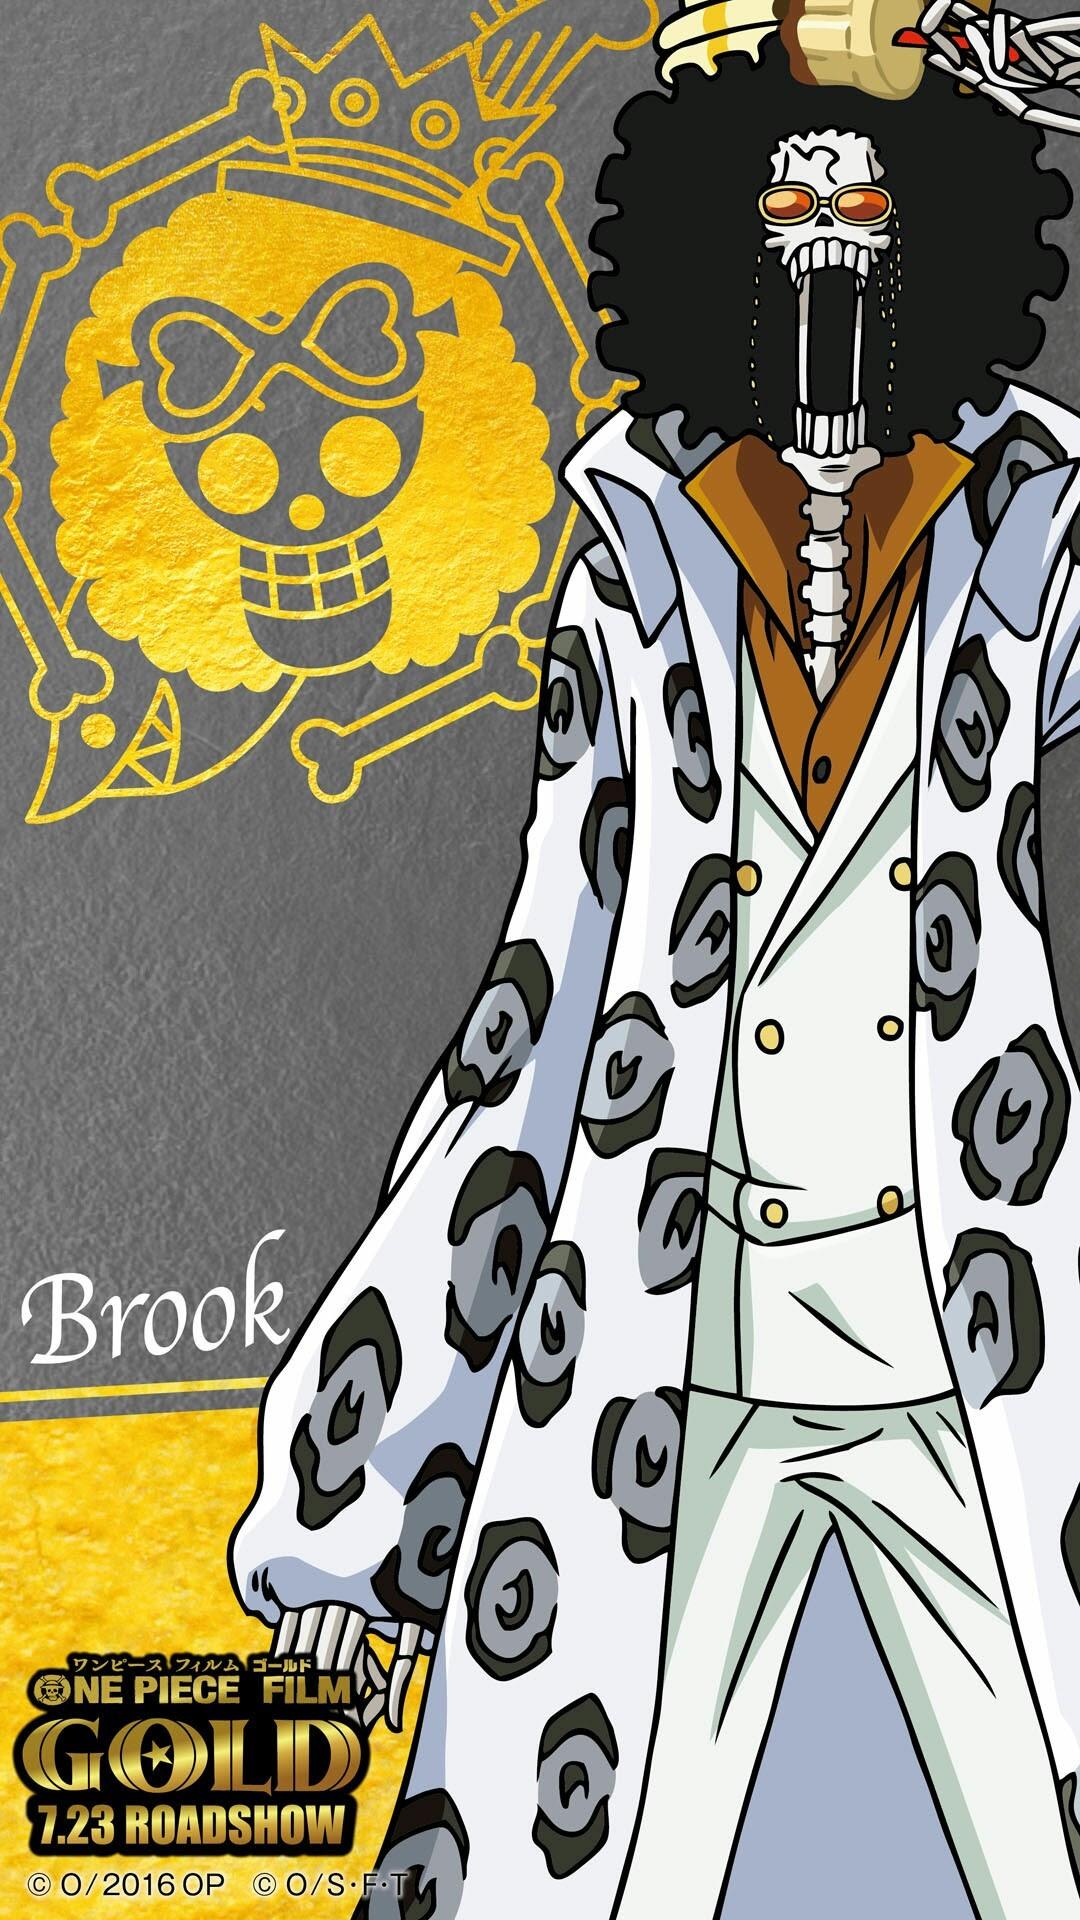 Brook One Piece Wallpaper : brook, piece, wallpaper, Piece, Brook, Wallpaper, Phone, Anime